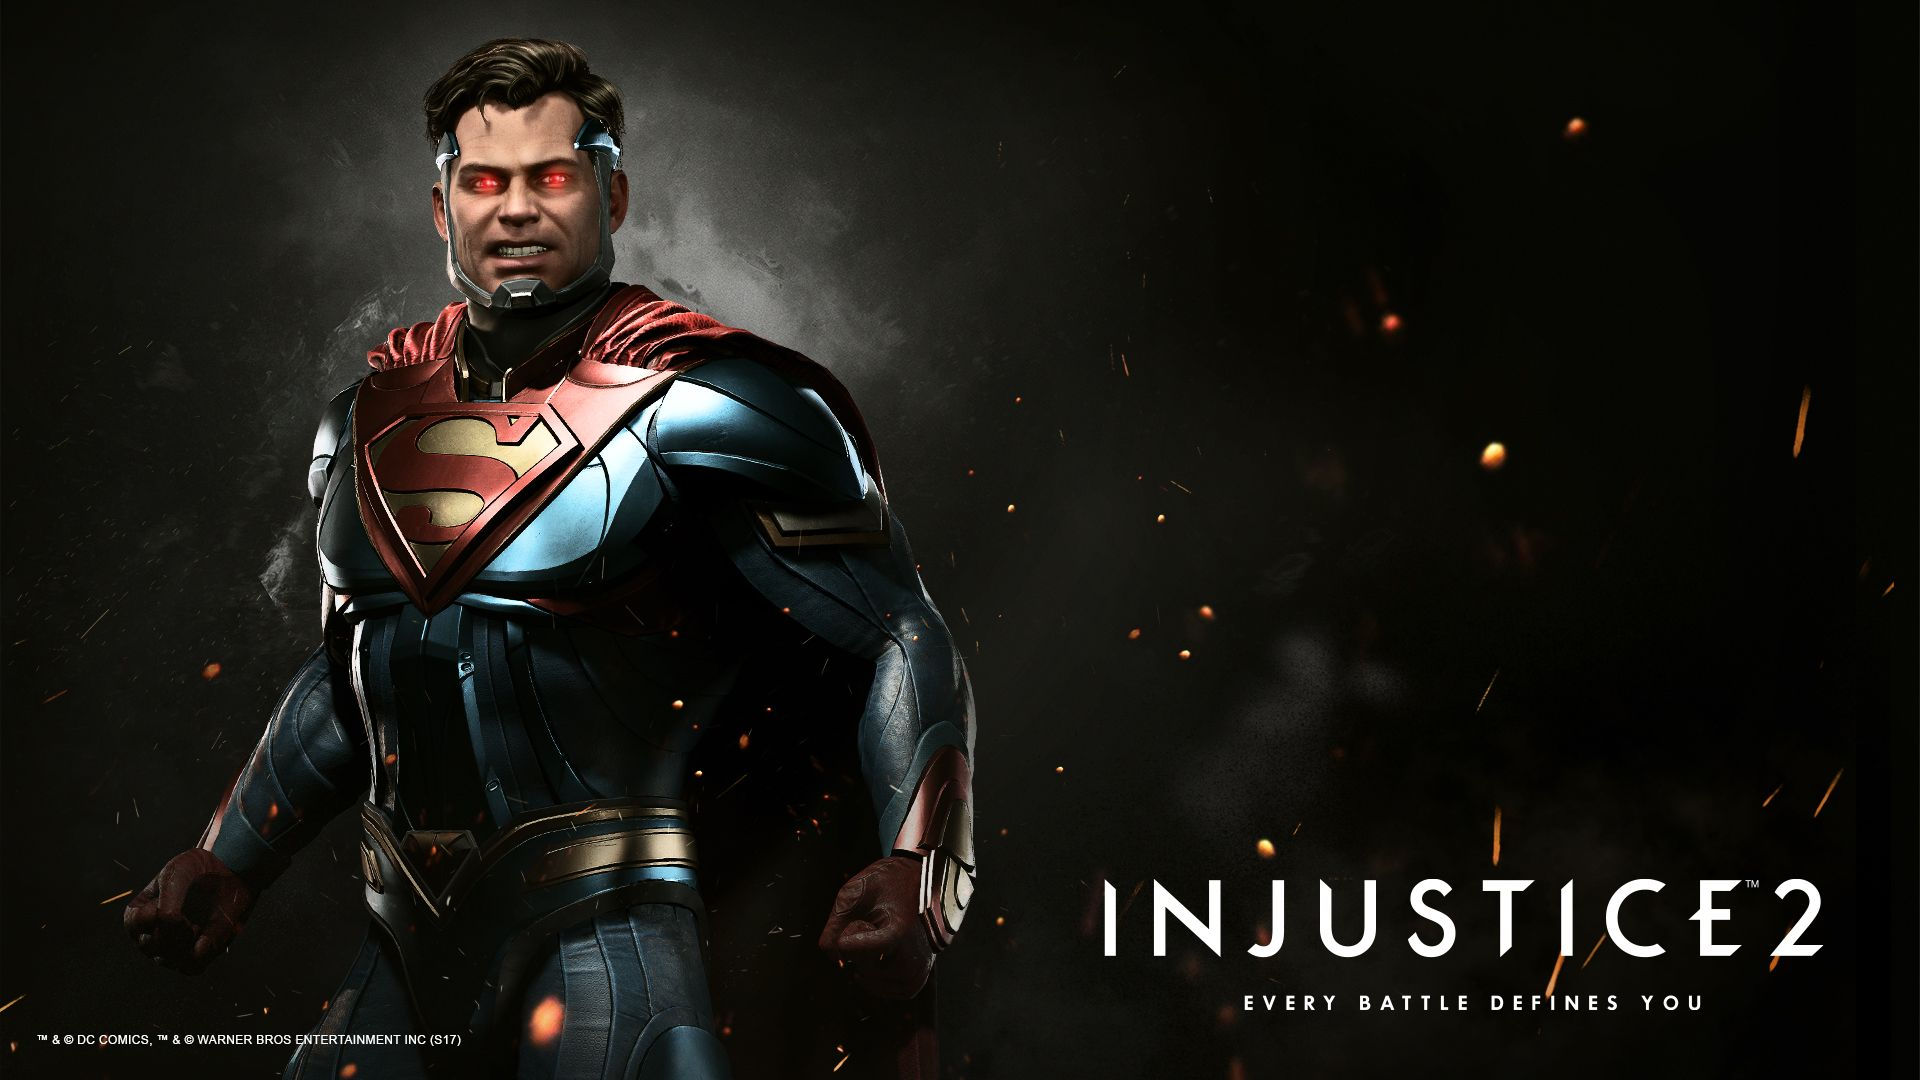 Image injustice2 superman wallpaper 1920x1080 42g injustice injustice2 superman wallpaper 1920x1080 42g voltagebd Images